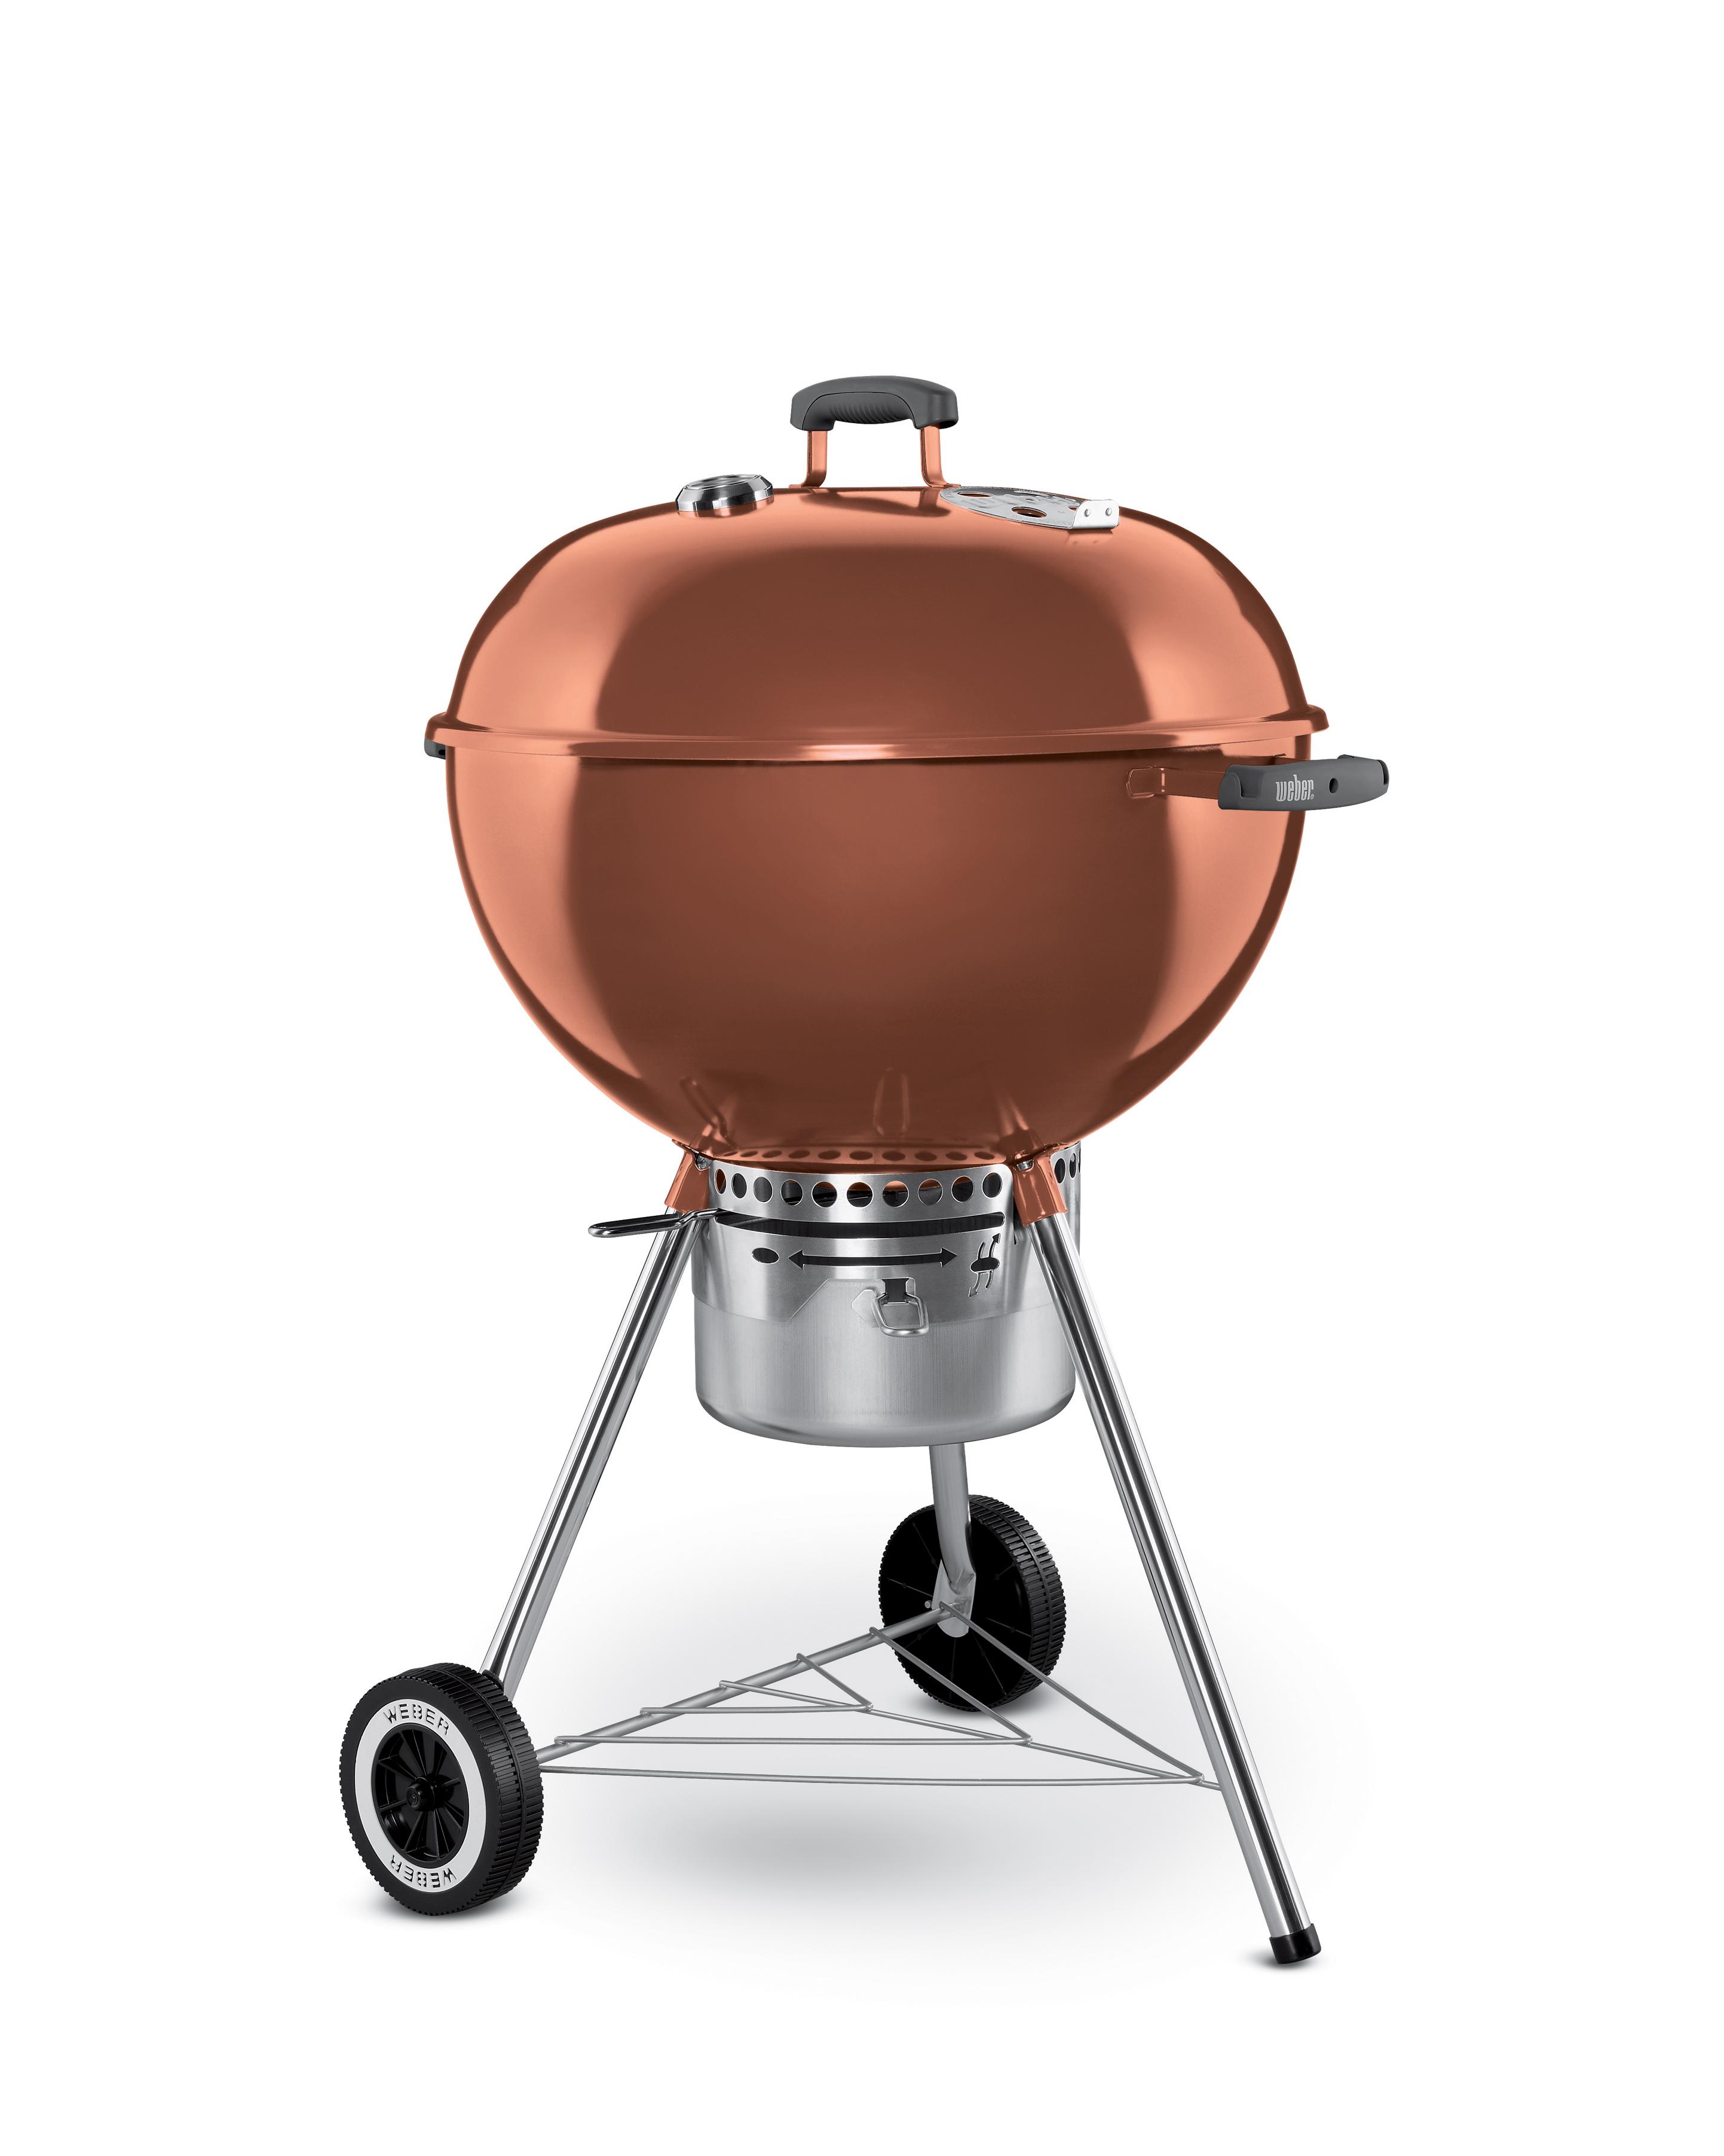 outdoor-registry-items-weber-copper-grill-0814.jpg